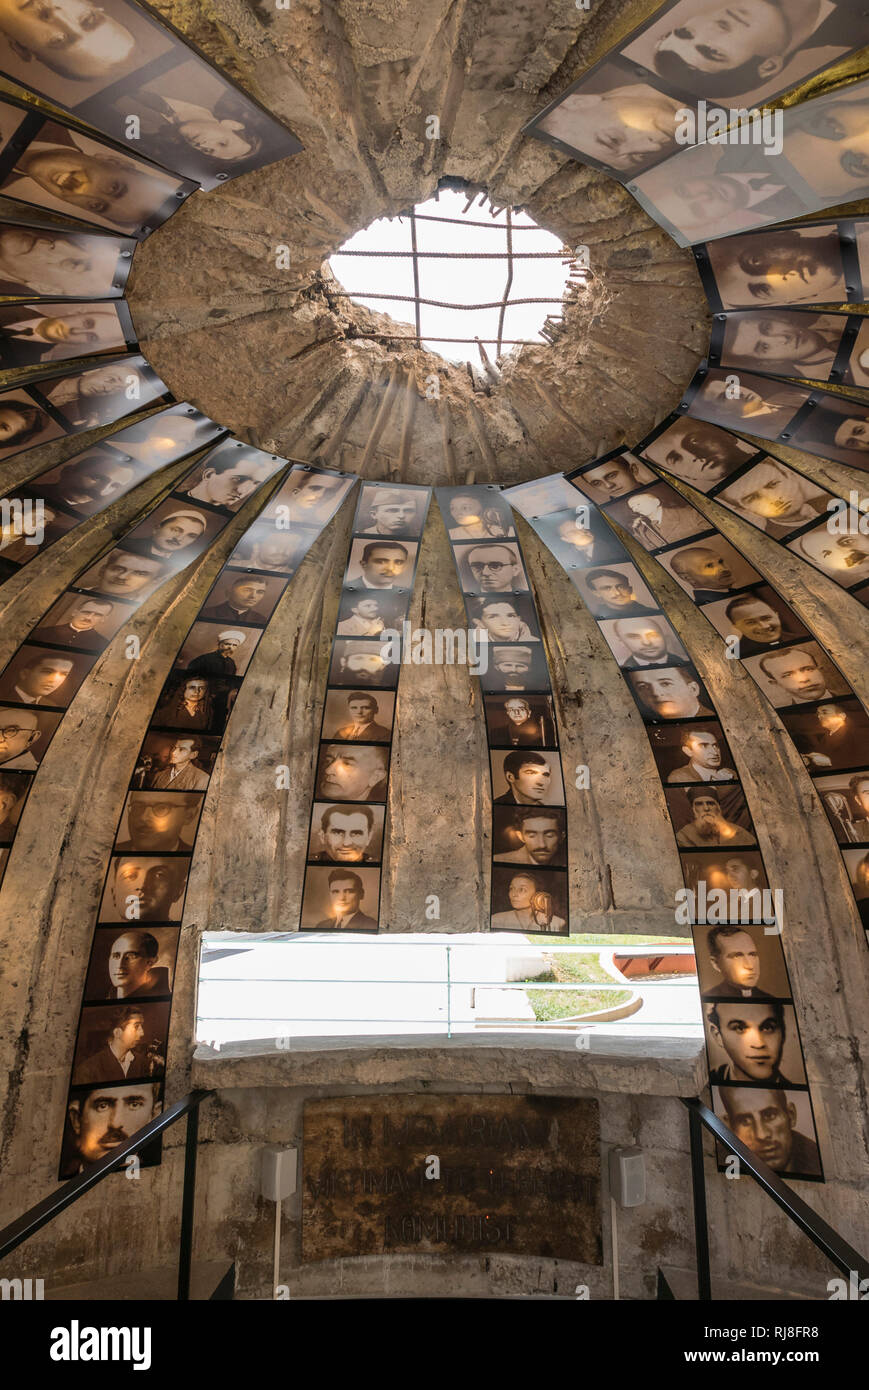 Albanien, Balkanhalbinsel, Südosteuropa, Republik Albanien, Hauptstadt Tirana, Skanderbeg-Platz Bunker - Stock Image